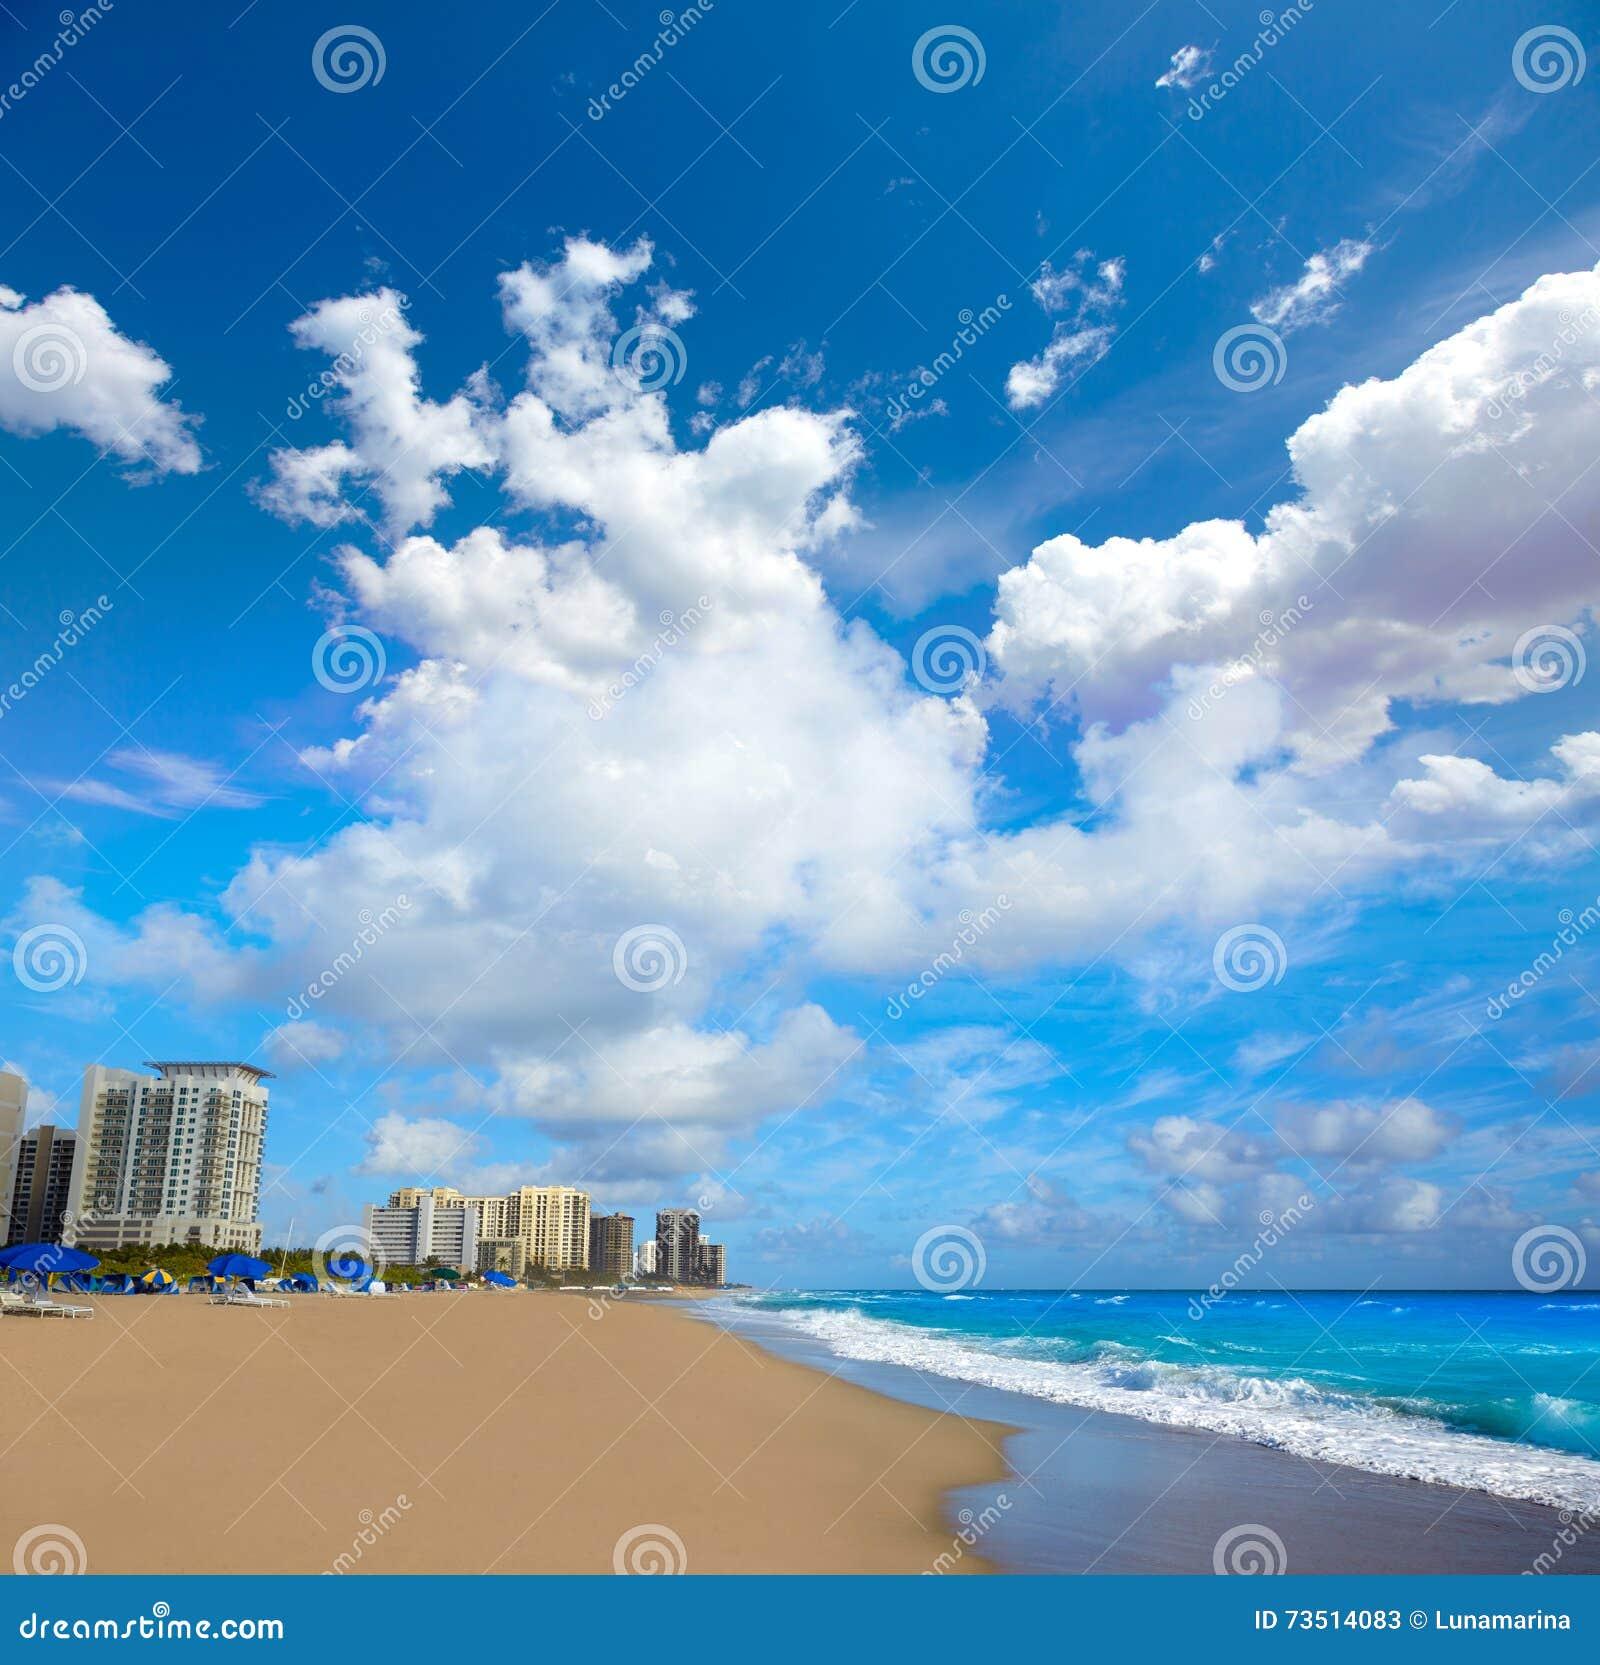 Singer Island (FL) United States  city images : Singer Island Beach At Palm Beach Florida US Stock Photo Image ...